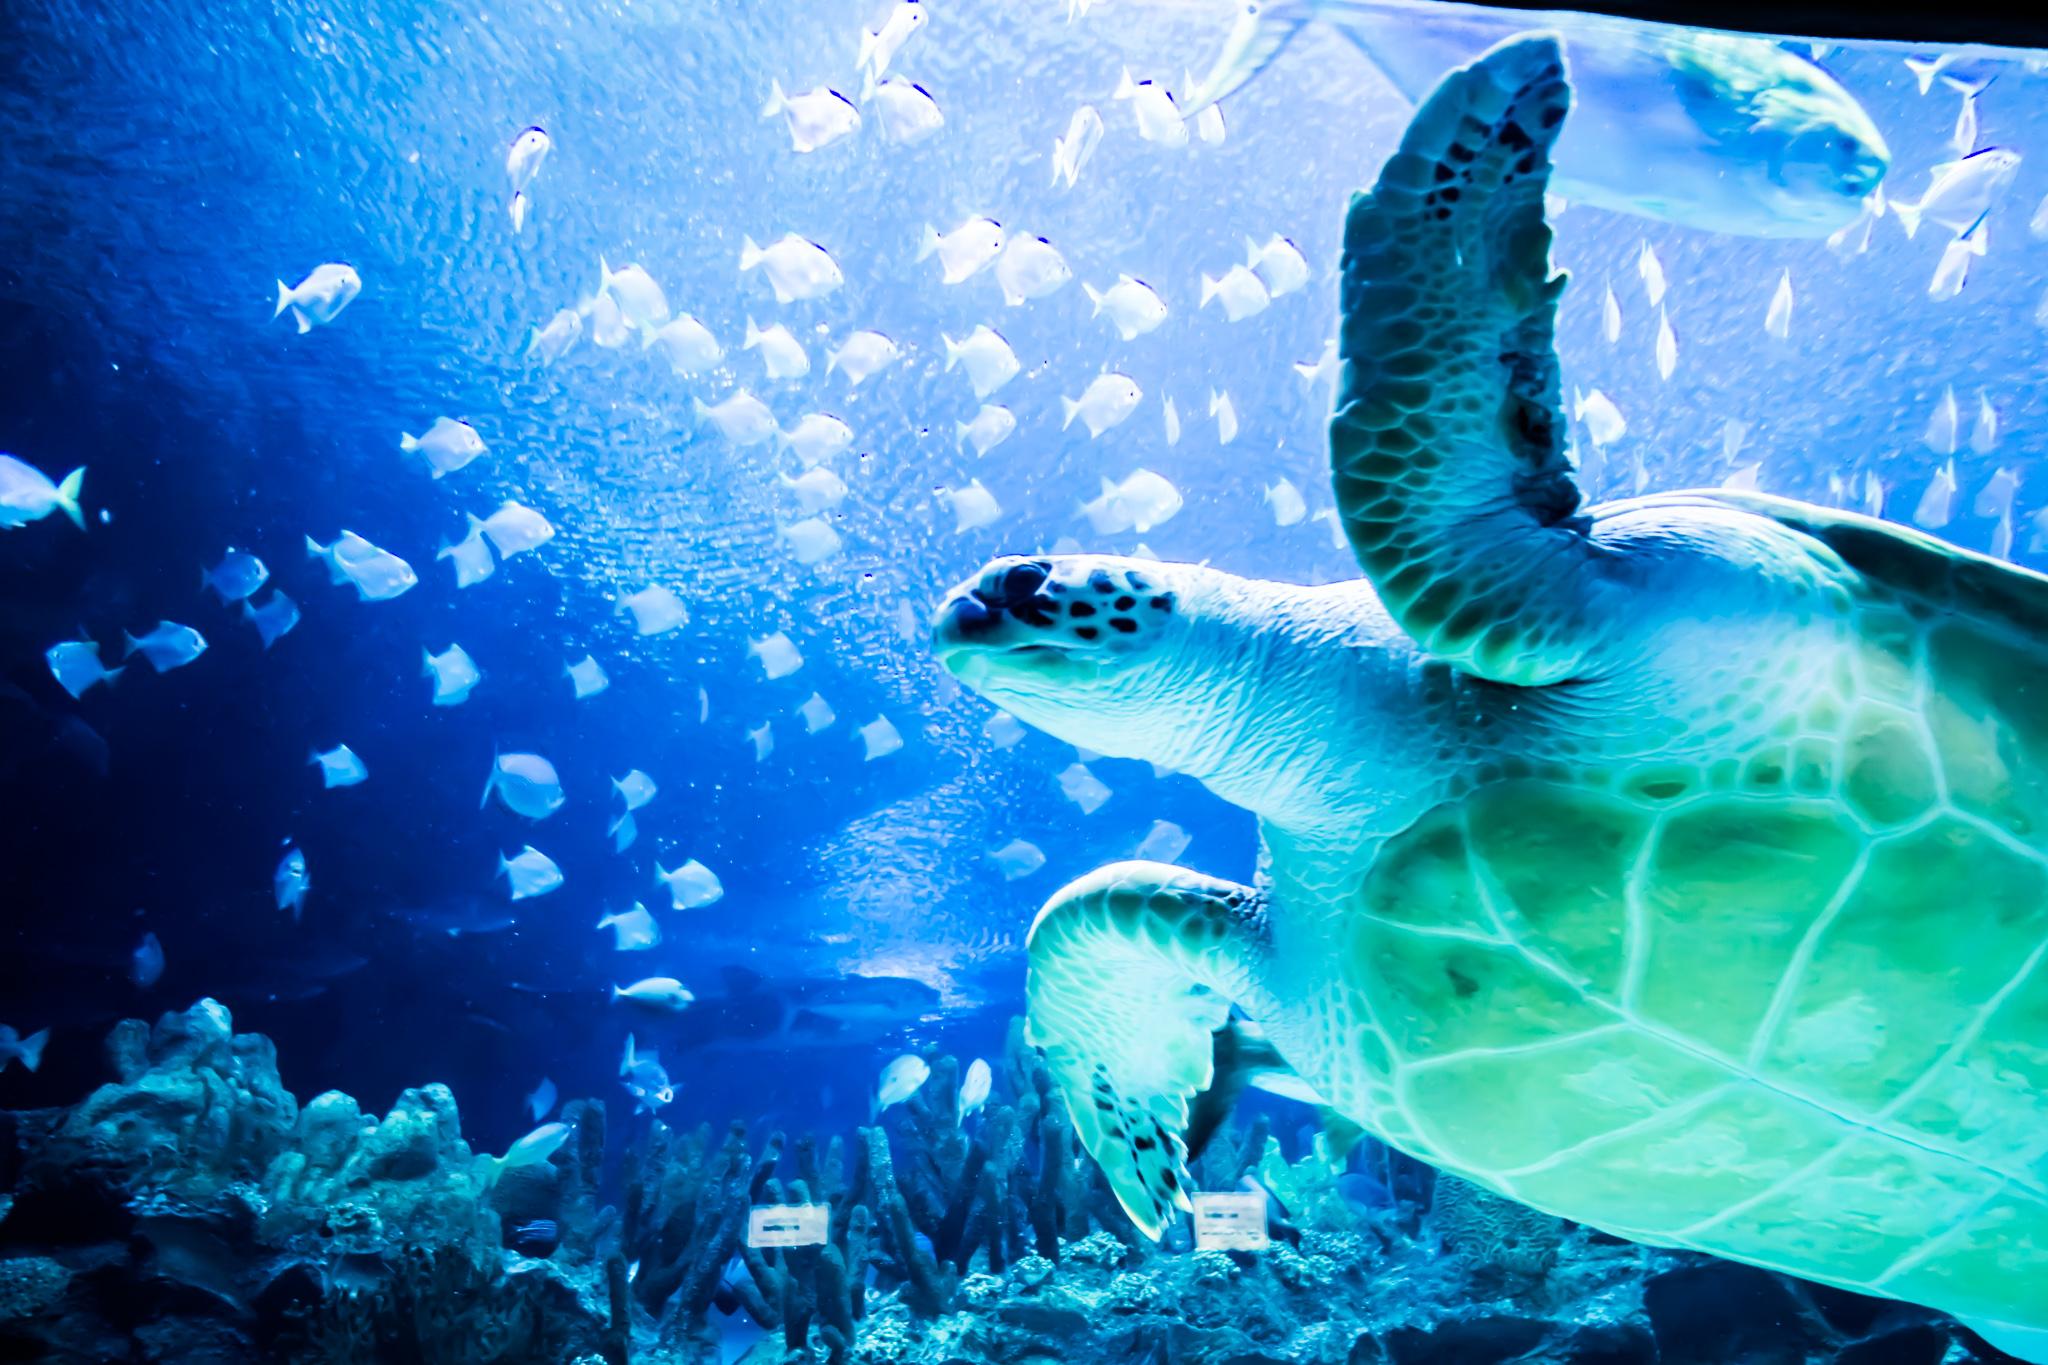 KLCC水族館 アイキャッチ画像